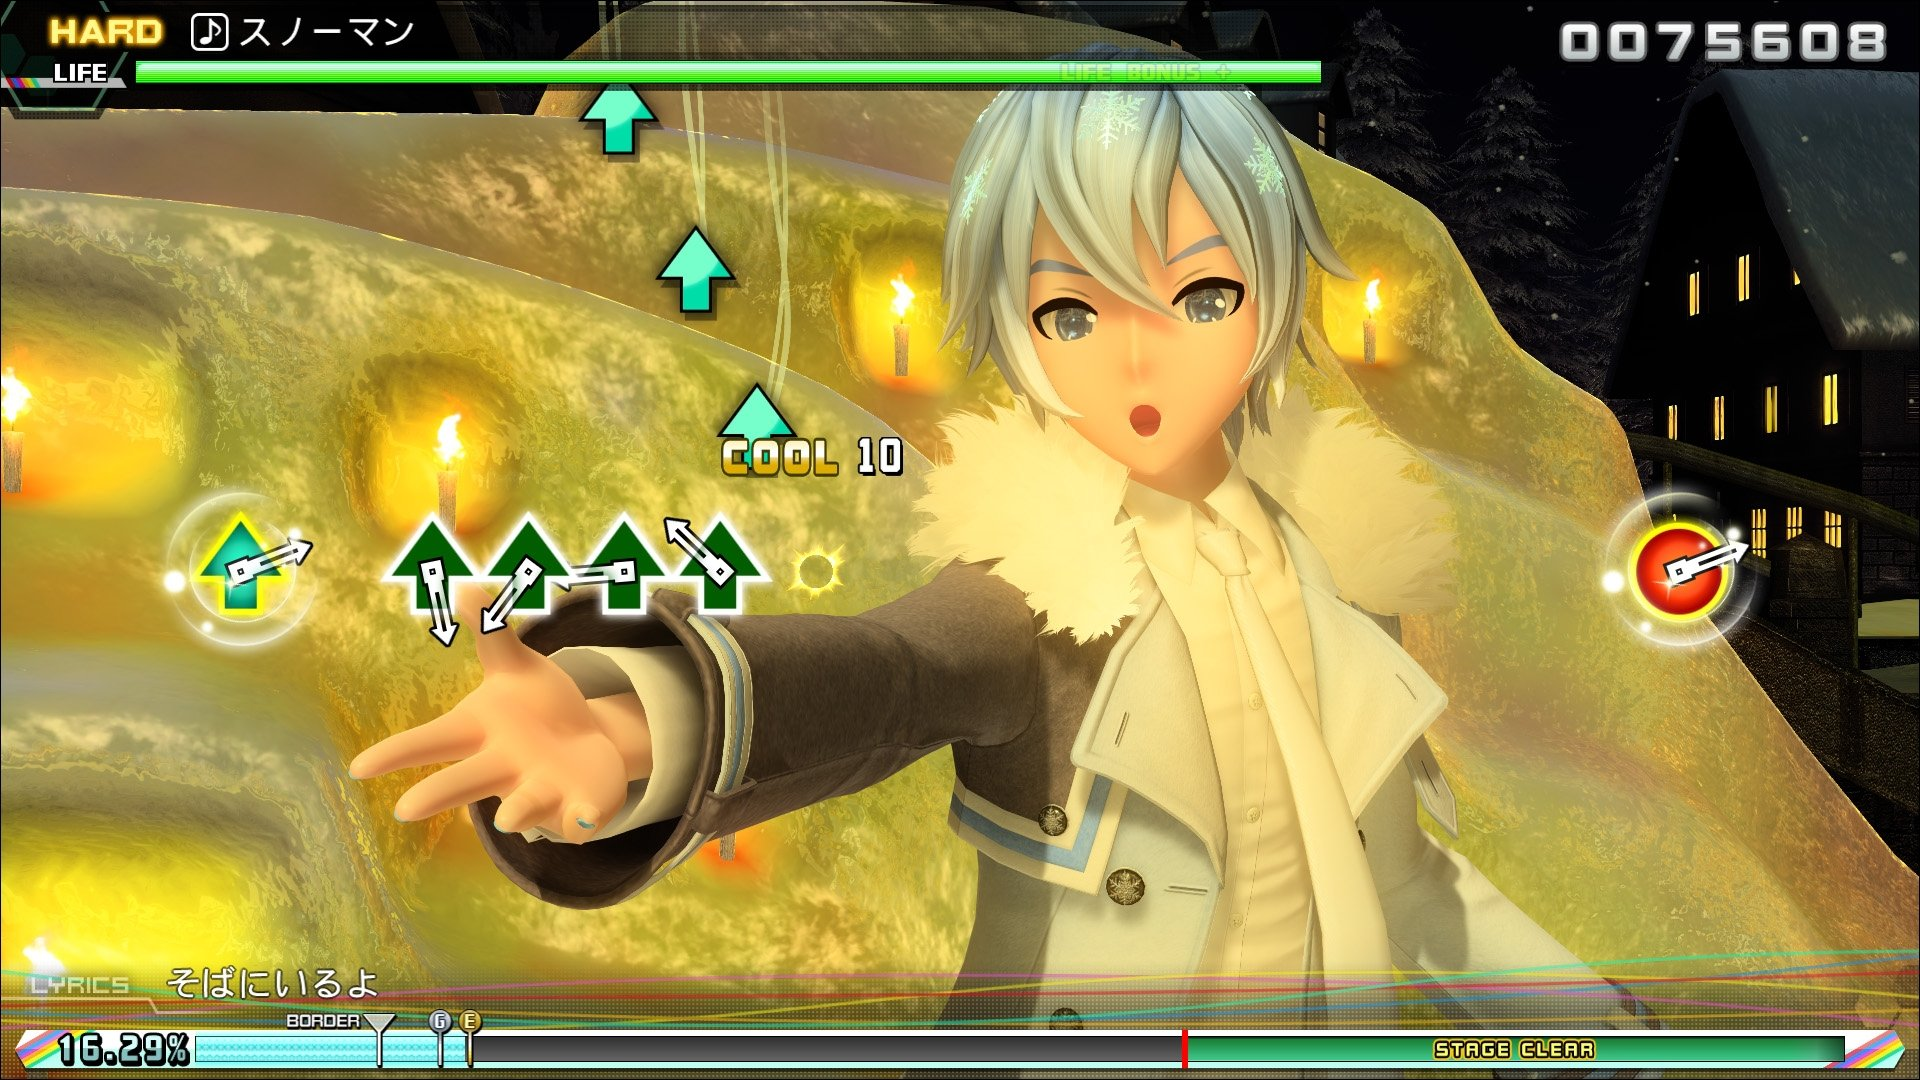 Hatsune Miku: Future Tone Review (PS4) - Rice Digital | Rice Digital